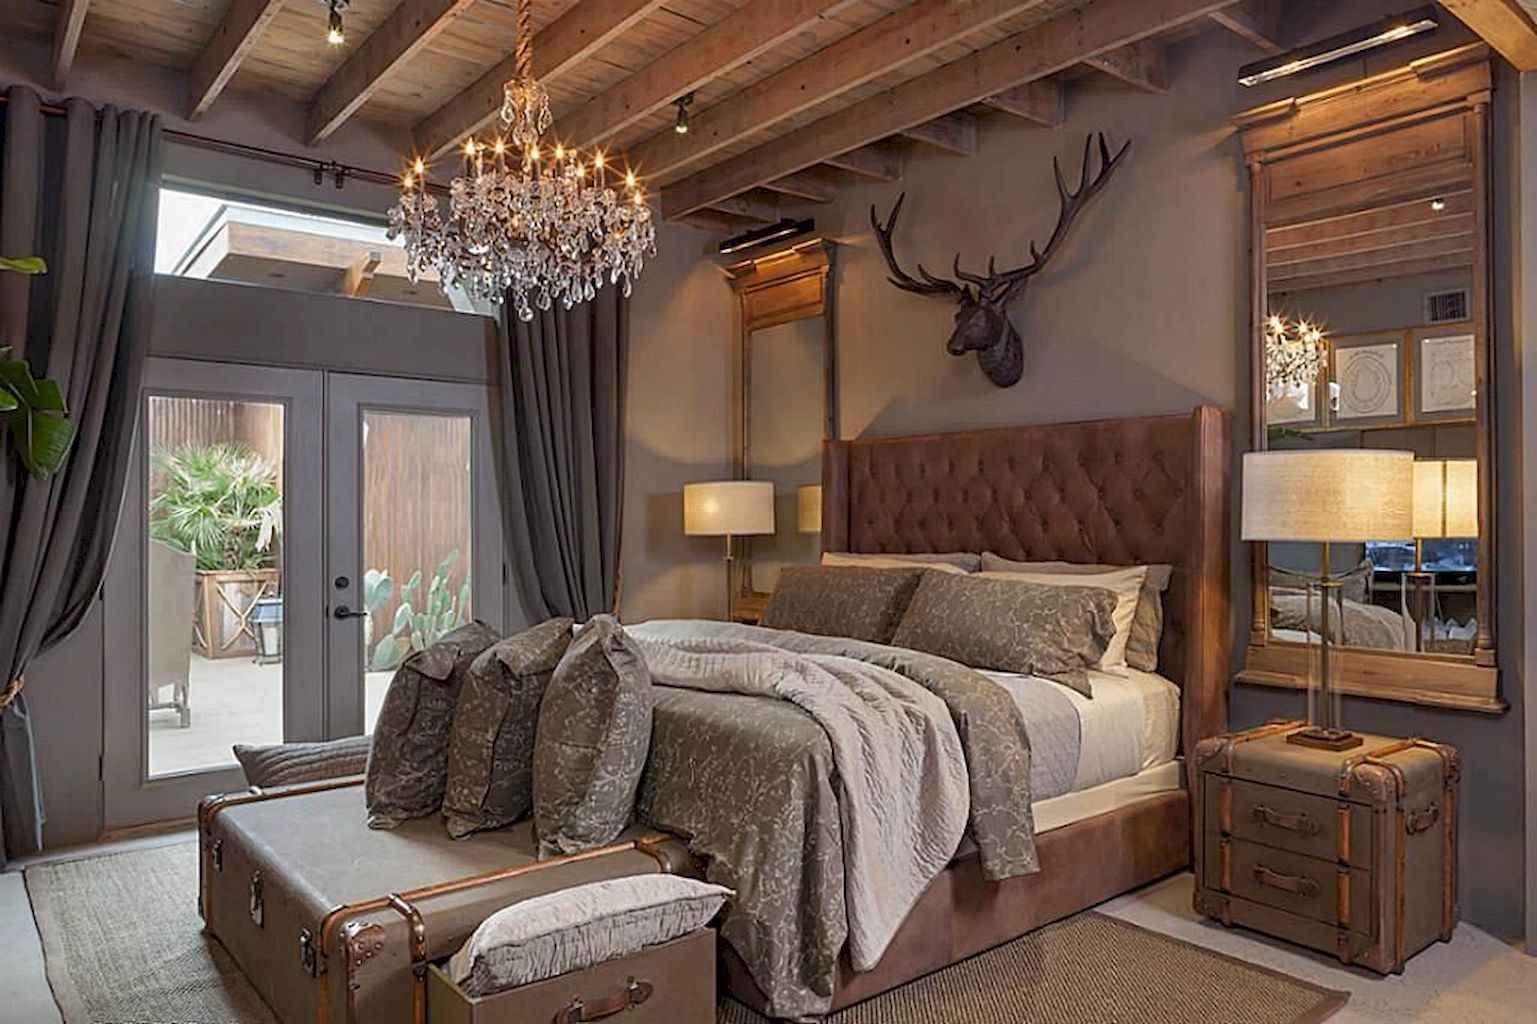 55 farmhouse master bedroom ideas rustic master bedroom on romantic trend master bedroom ideas id=76184